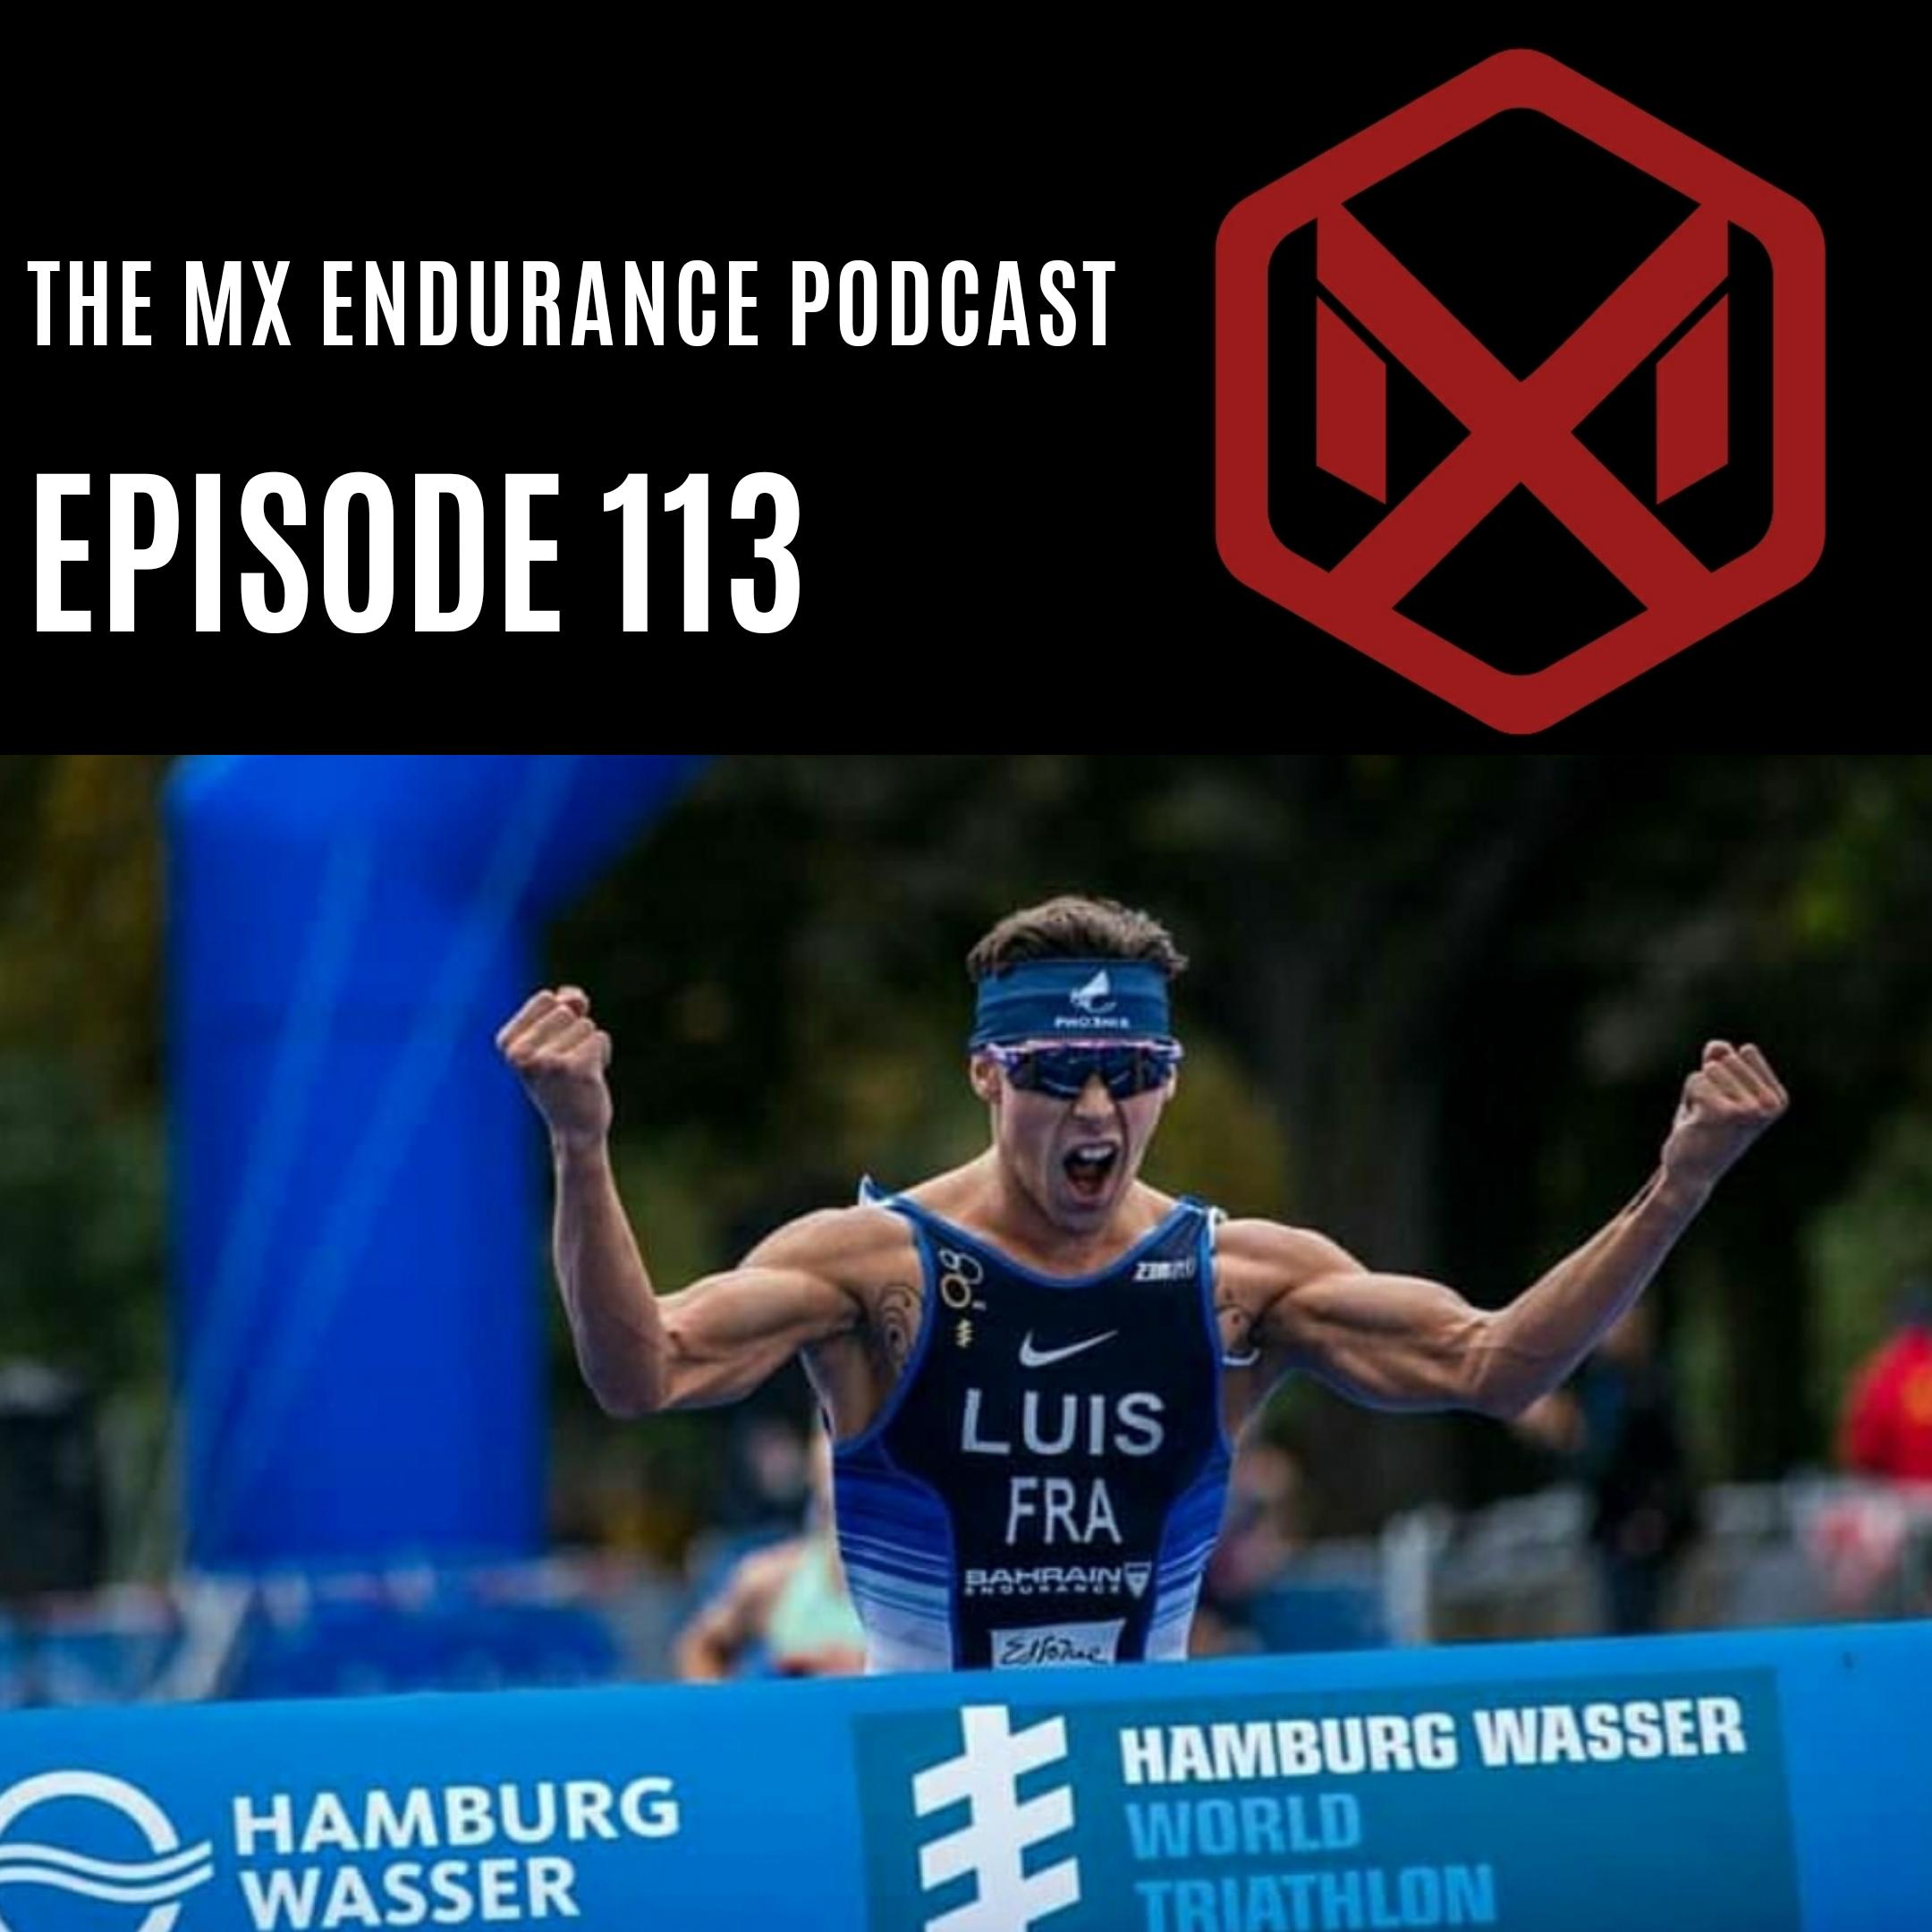 #113 - Is Iron Man the Future of Triathlon?